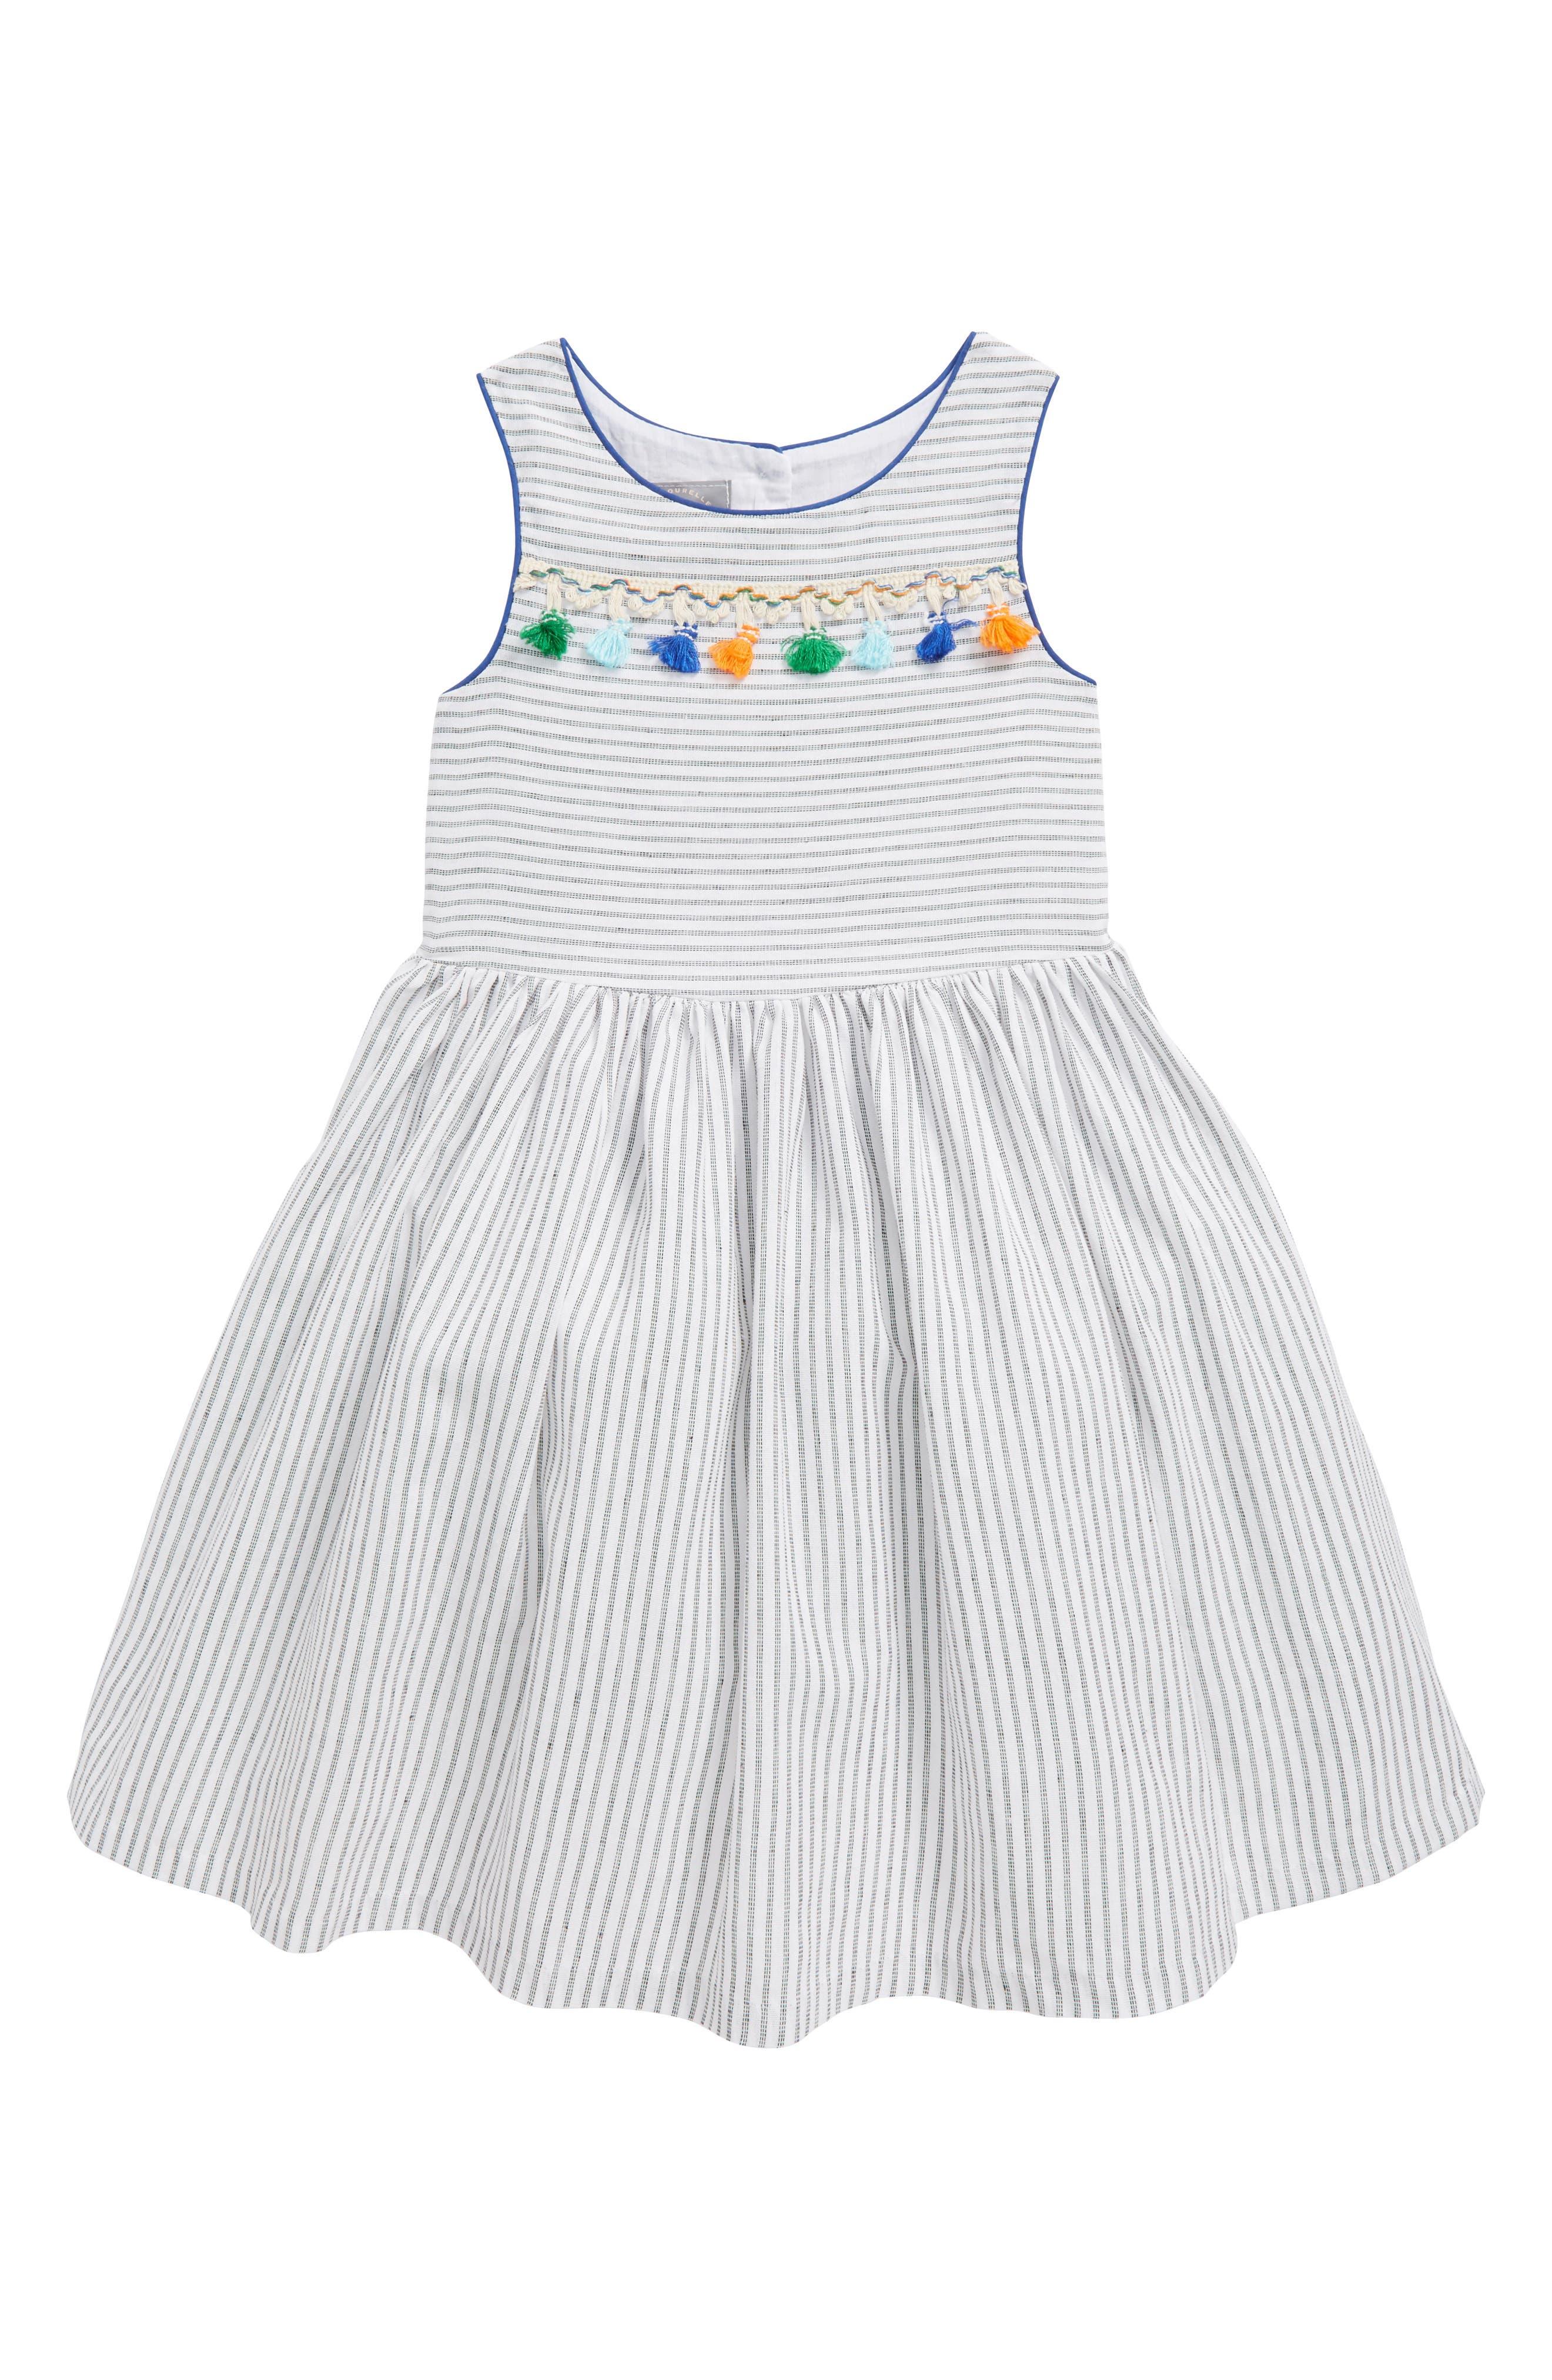 Pastourelle by Pippa & Julie Stripe Sleeveless Dress (Toddler Girls, Little Girls & Big Girls)